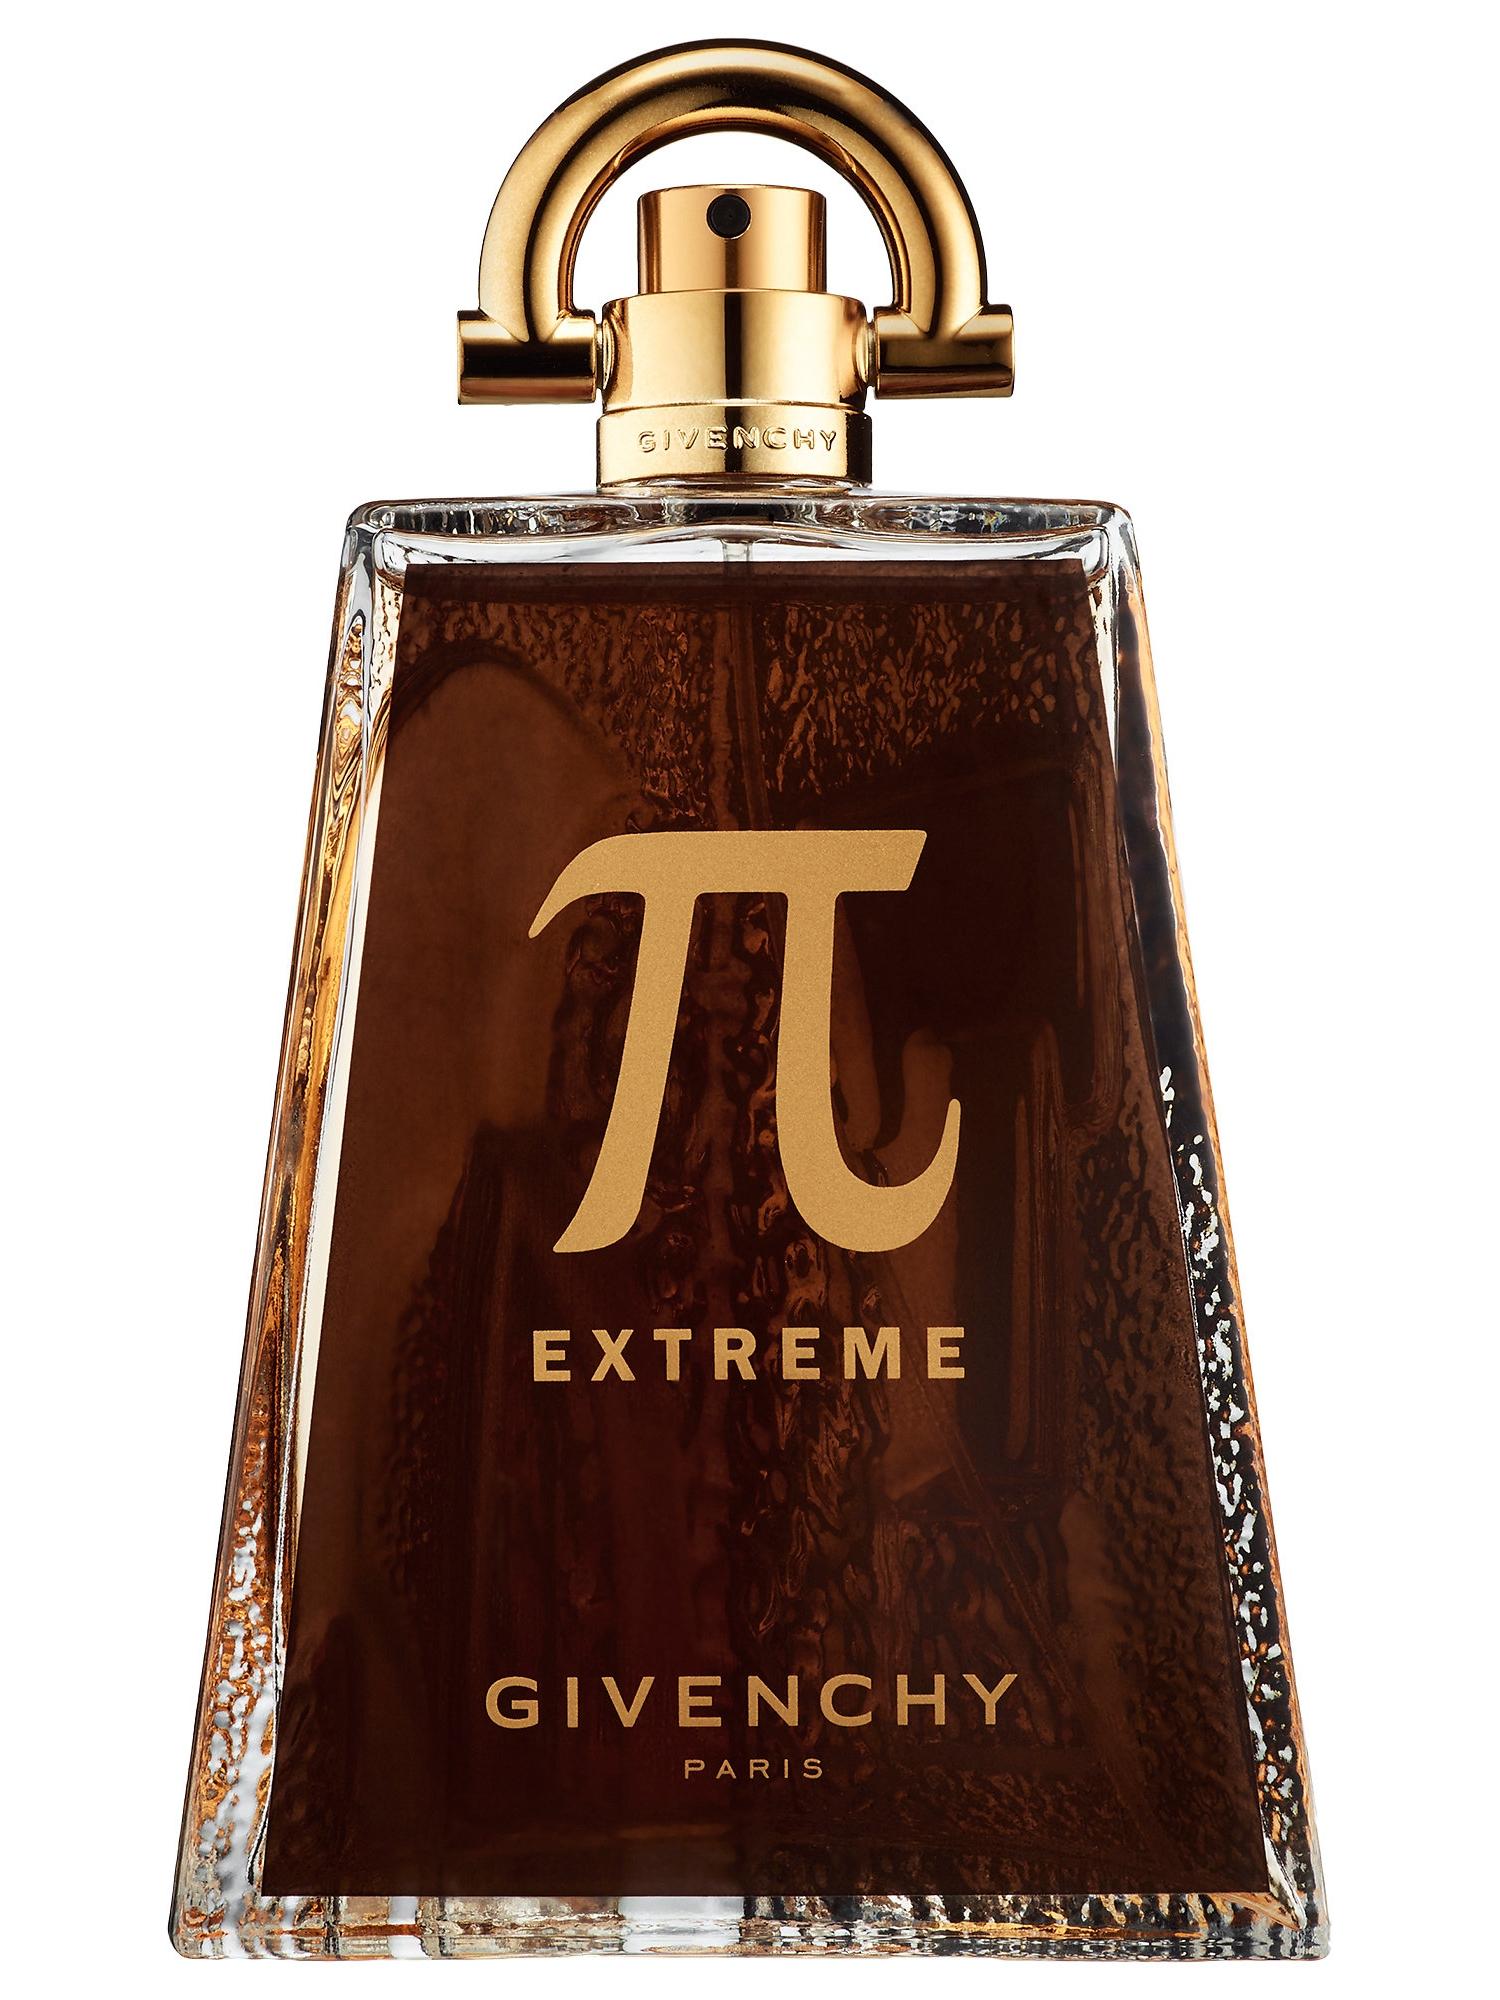 Givenchy Pi Extreme туалетная вода 100мл тестер (Живанши Пи Экстрем)